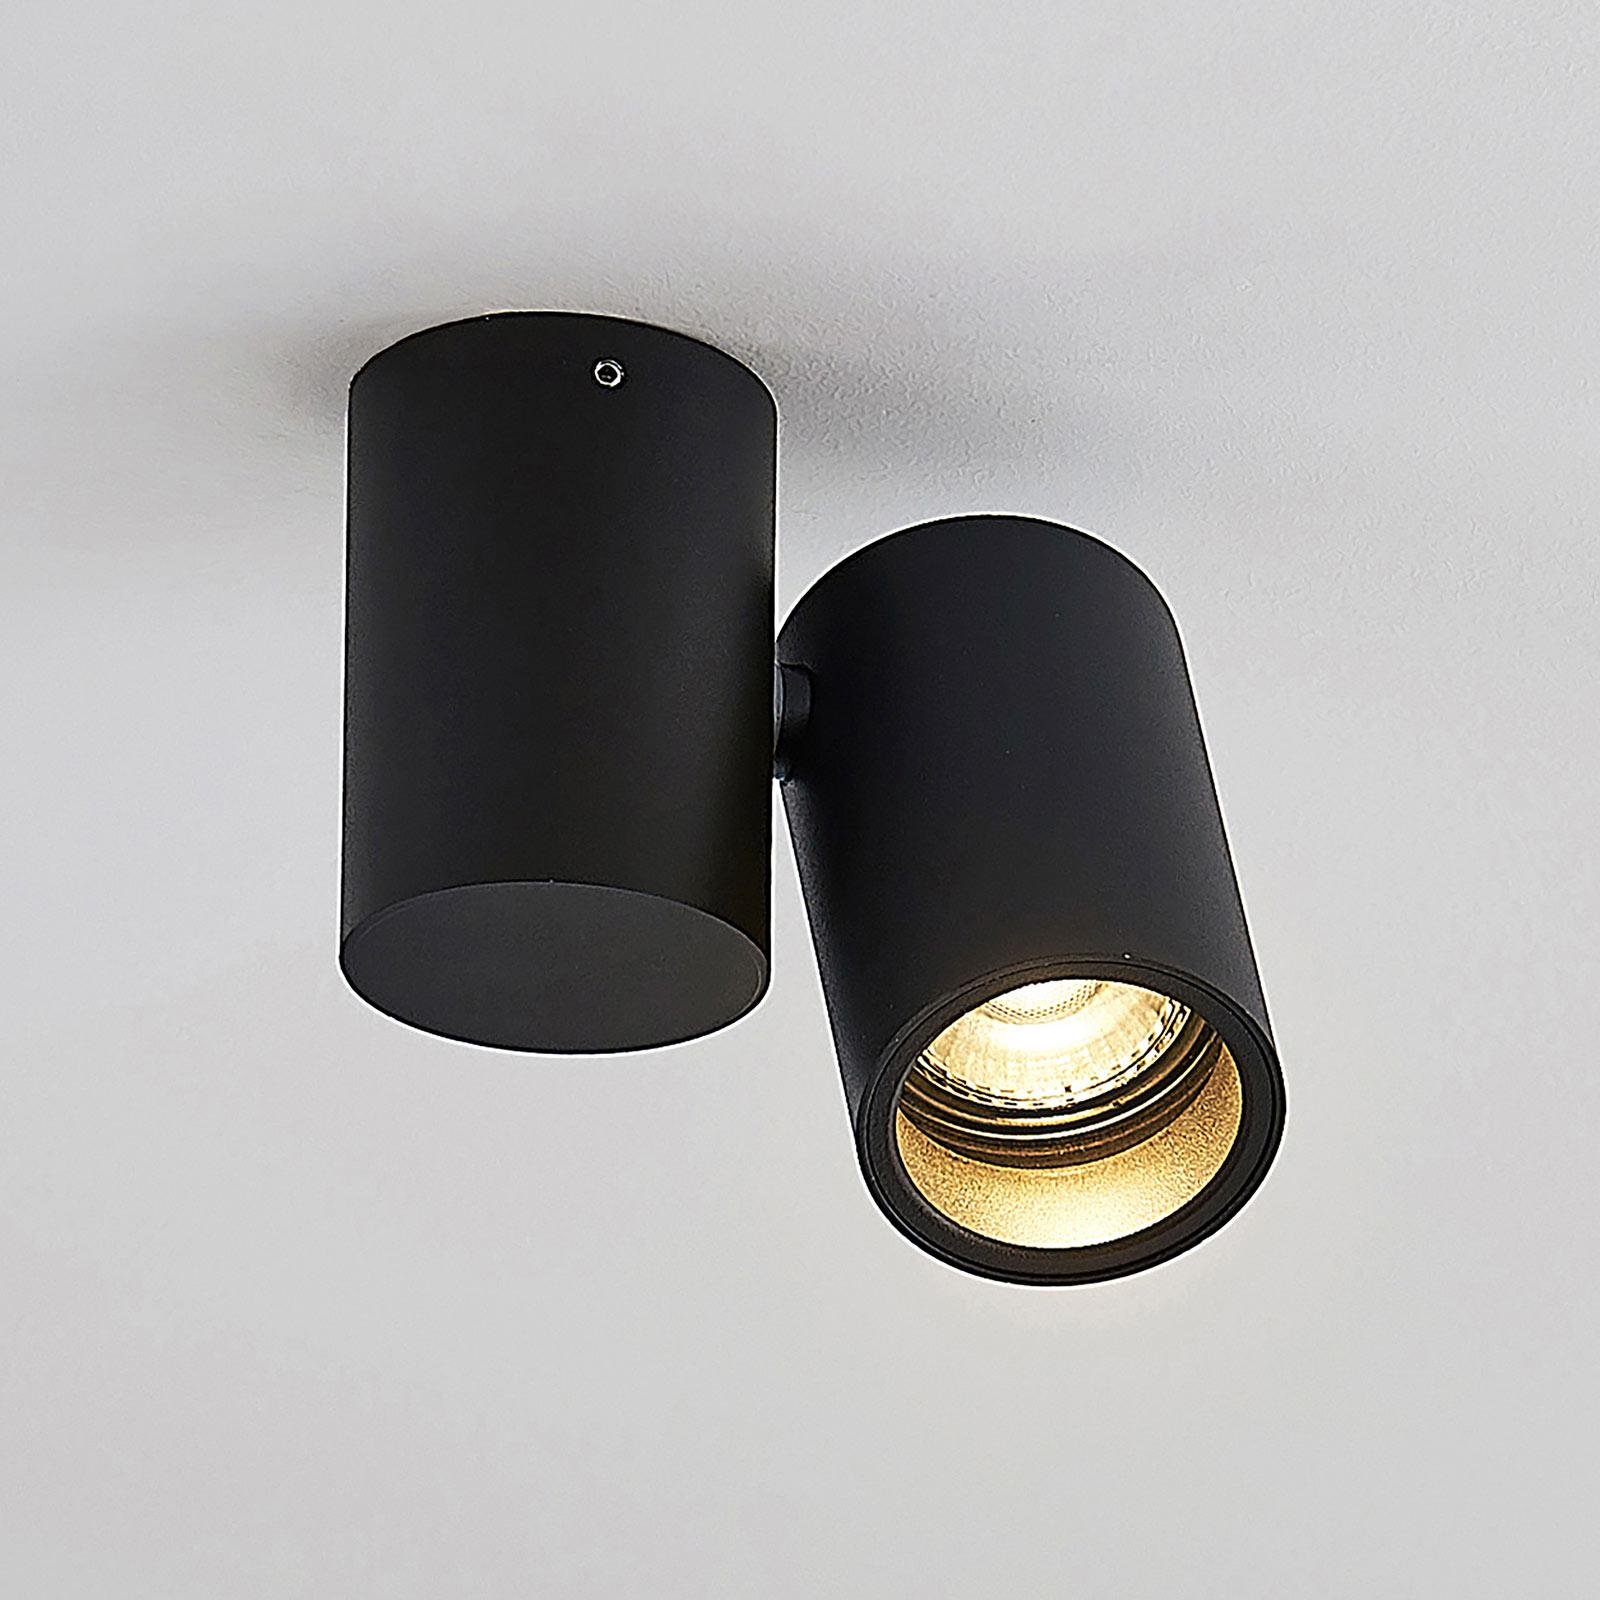 Lampa sufitowa Gesina, 1-punktowa, czarna